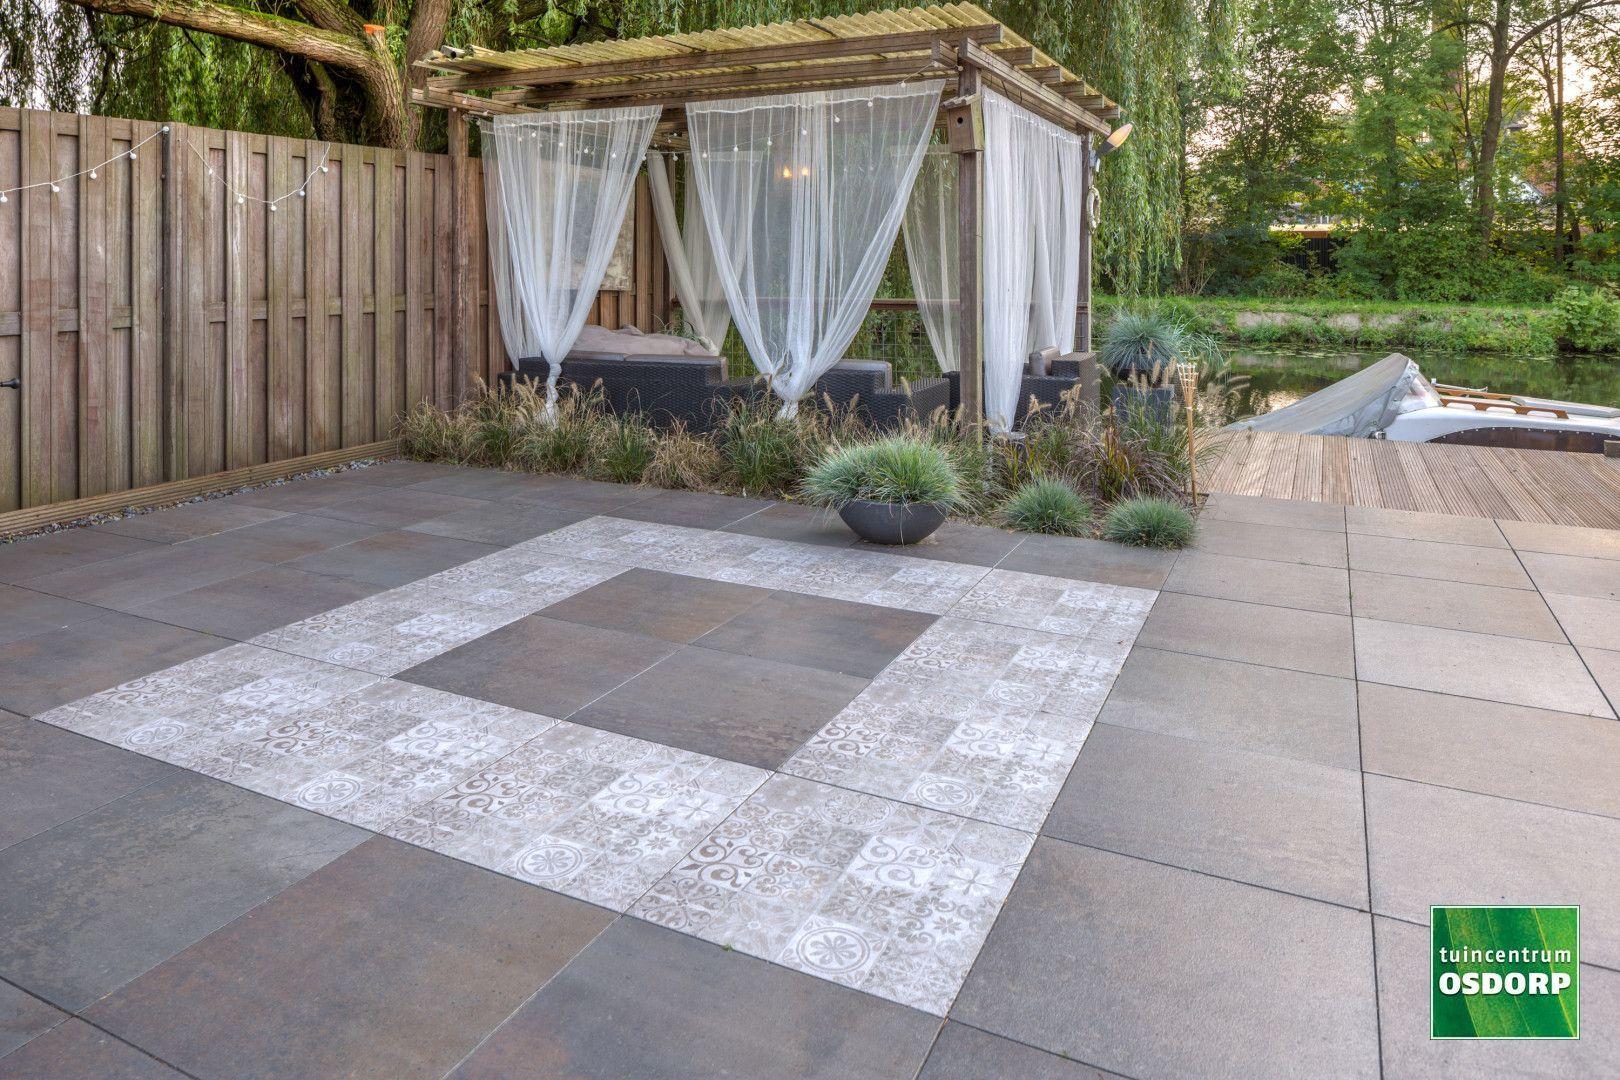 Patroon Tegels Tuin.Beton Siertegels In 2019 Tuin Ideeen Tuin En Tuintegels